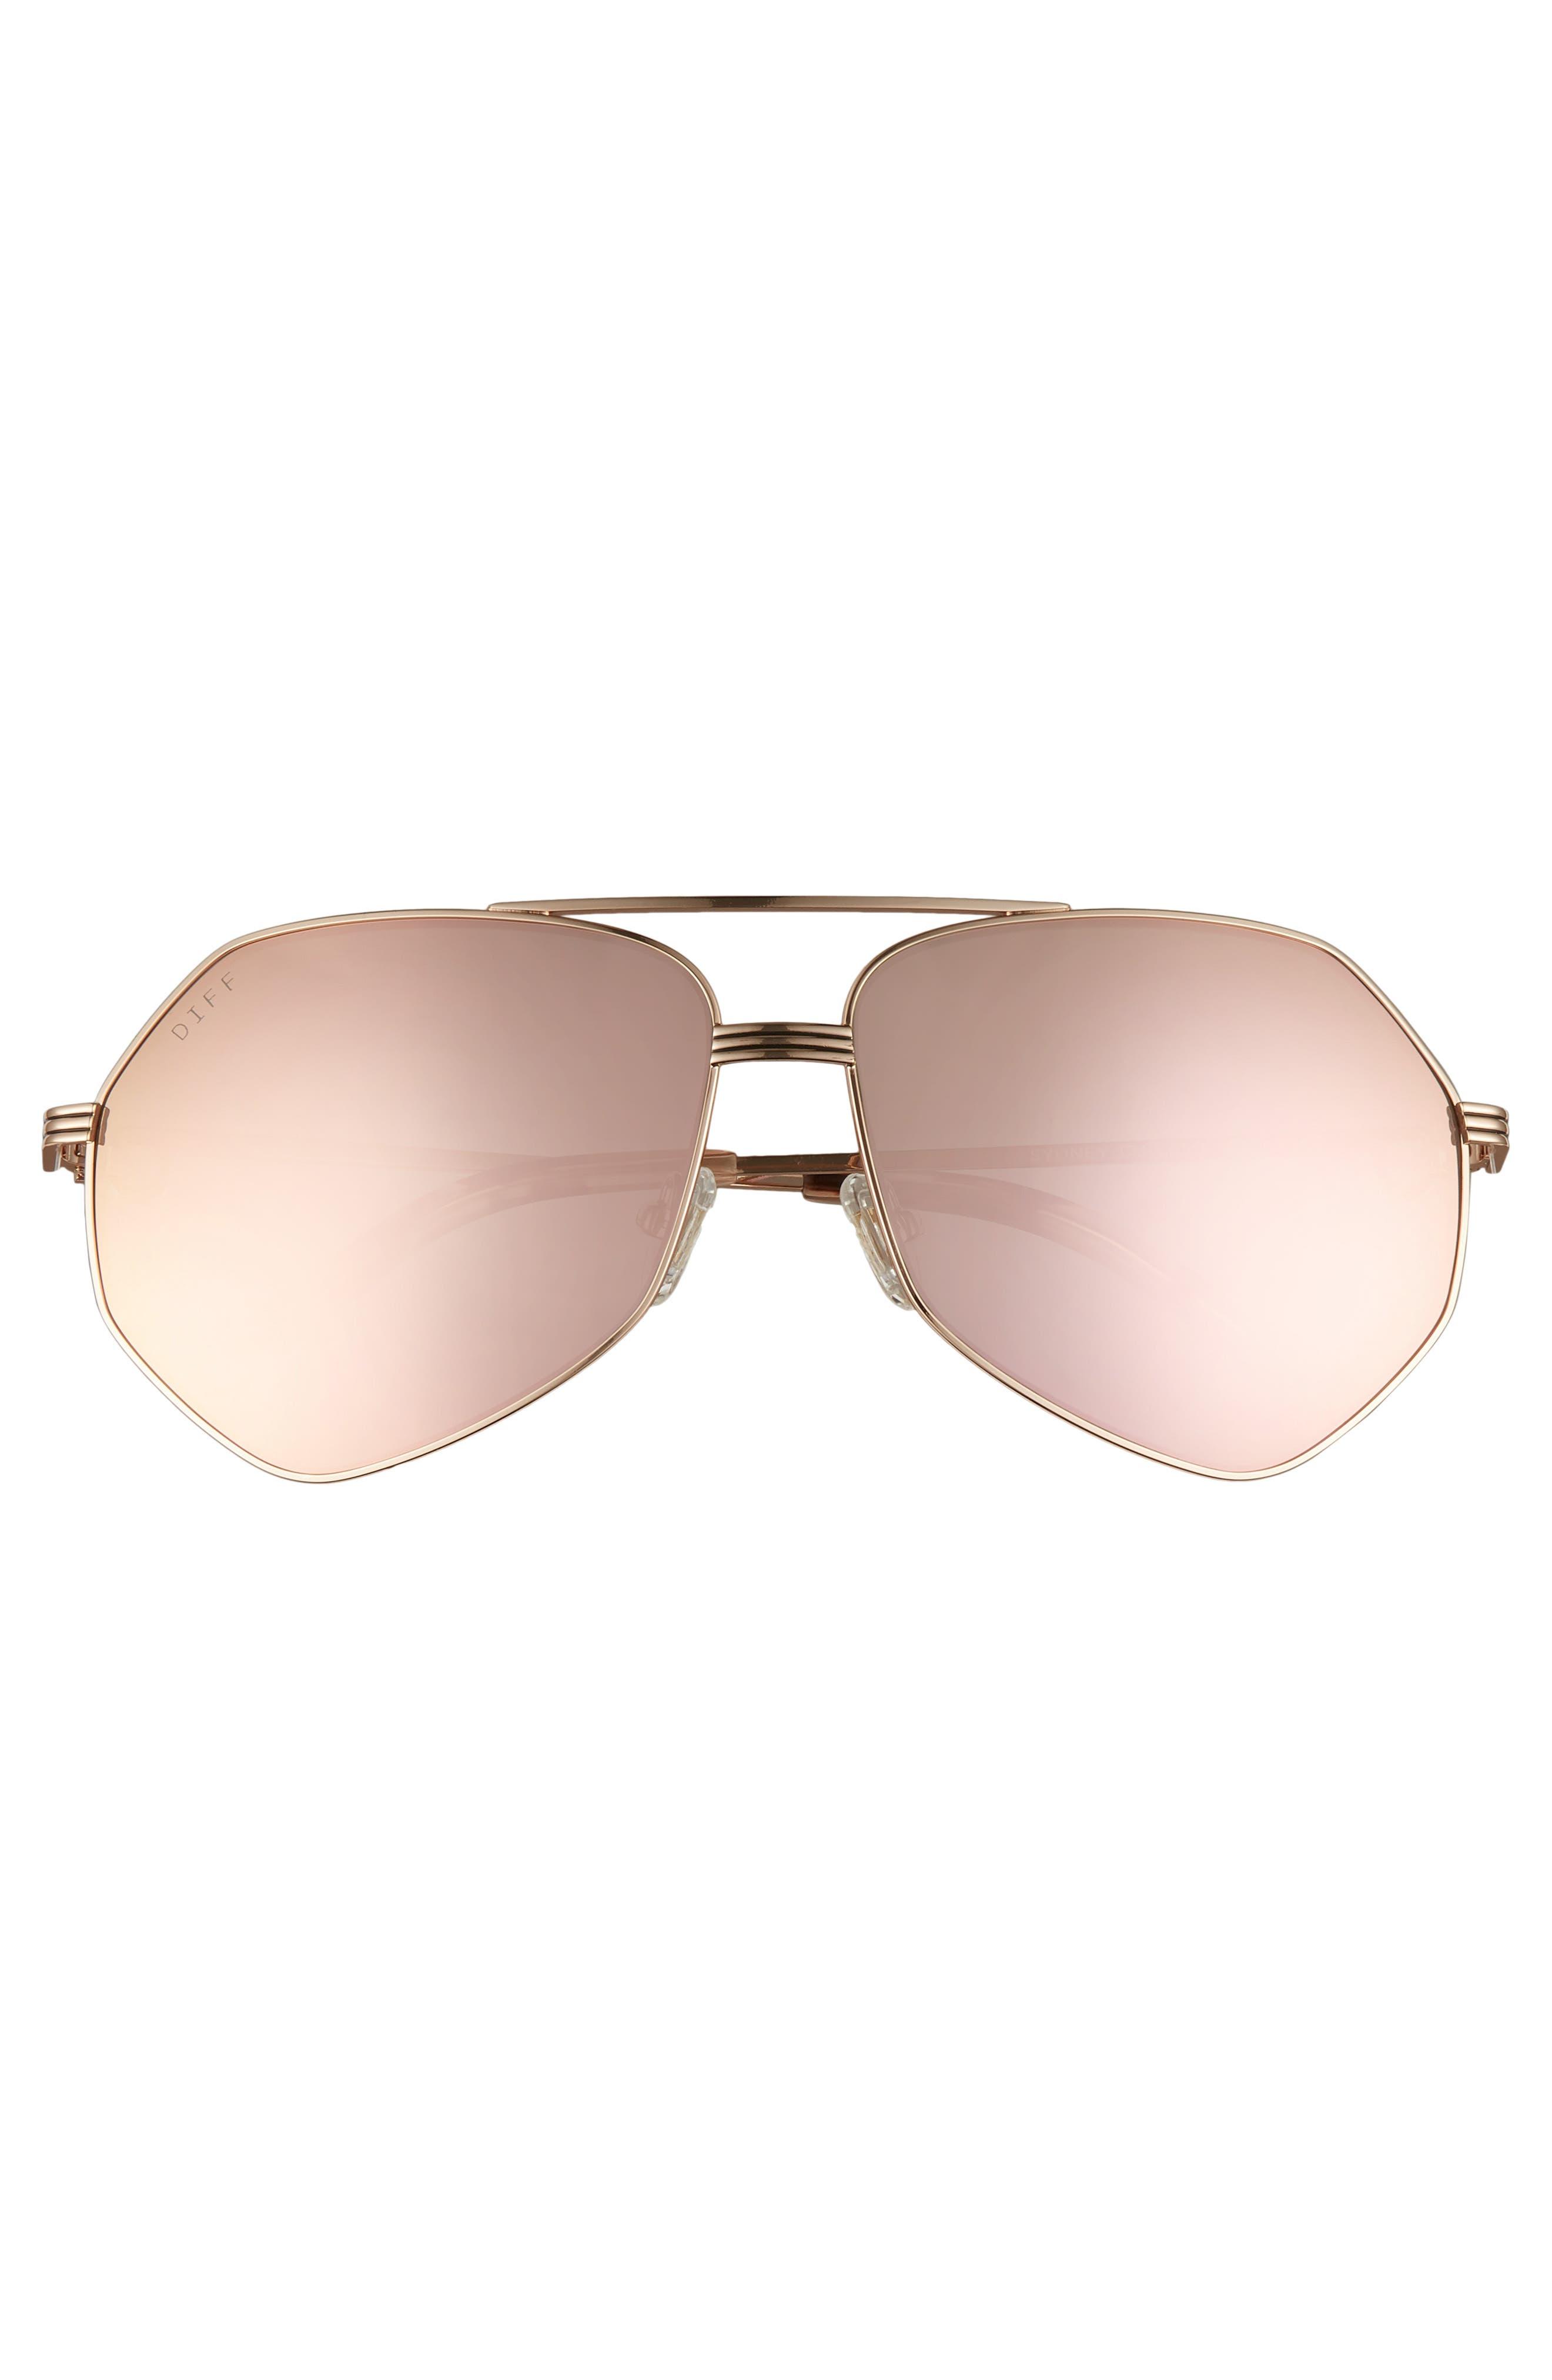 Sydney 62mm Polarized Aviator Sunglasses,                             Alternate thumbnail 3, color,                             GOLD/ HIMALAYAN/ CHAMPAGNE